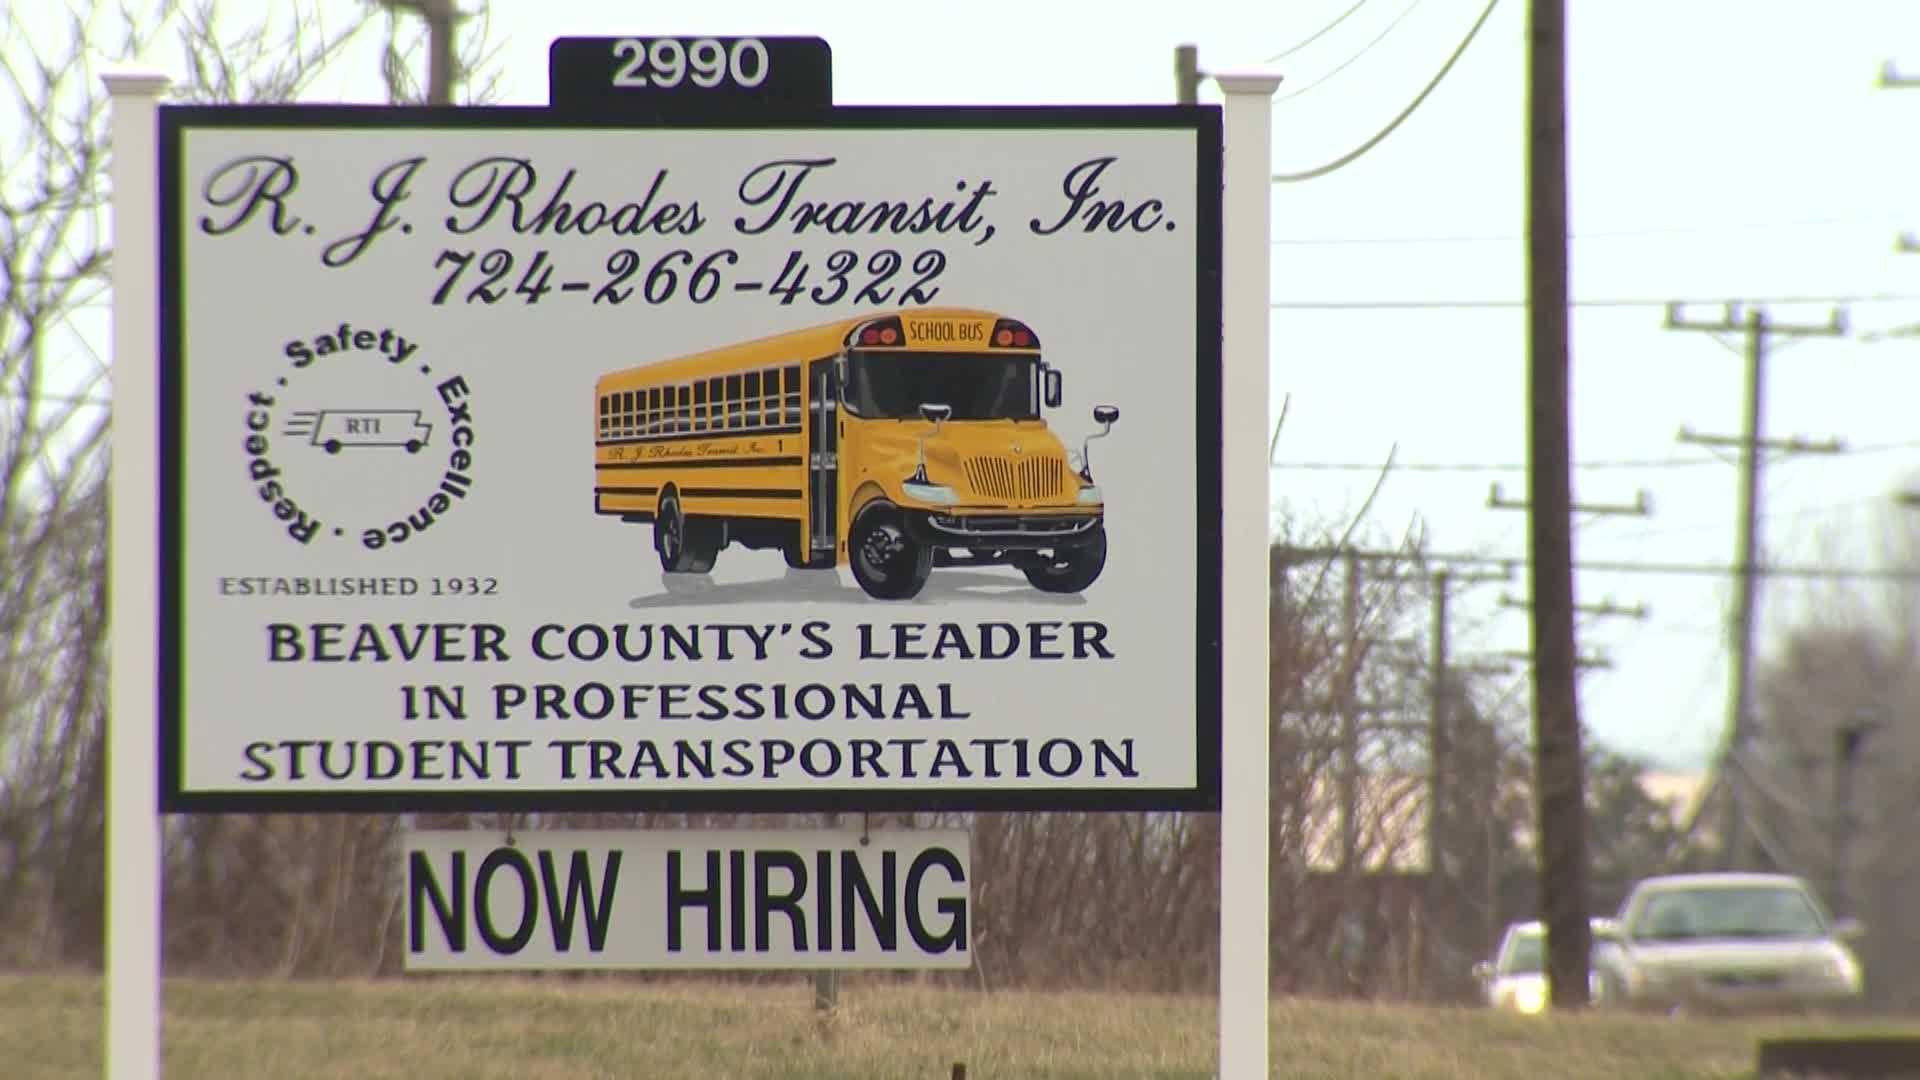 R.J. Rhodes bus company